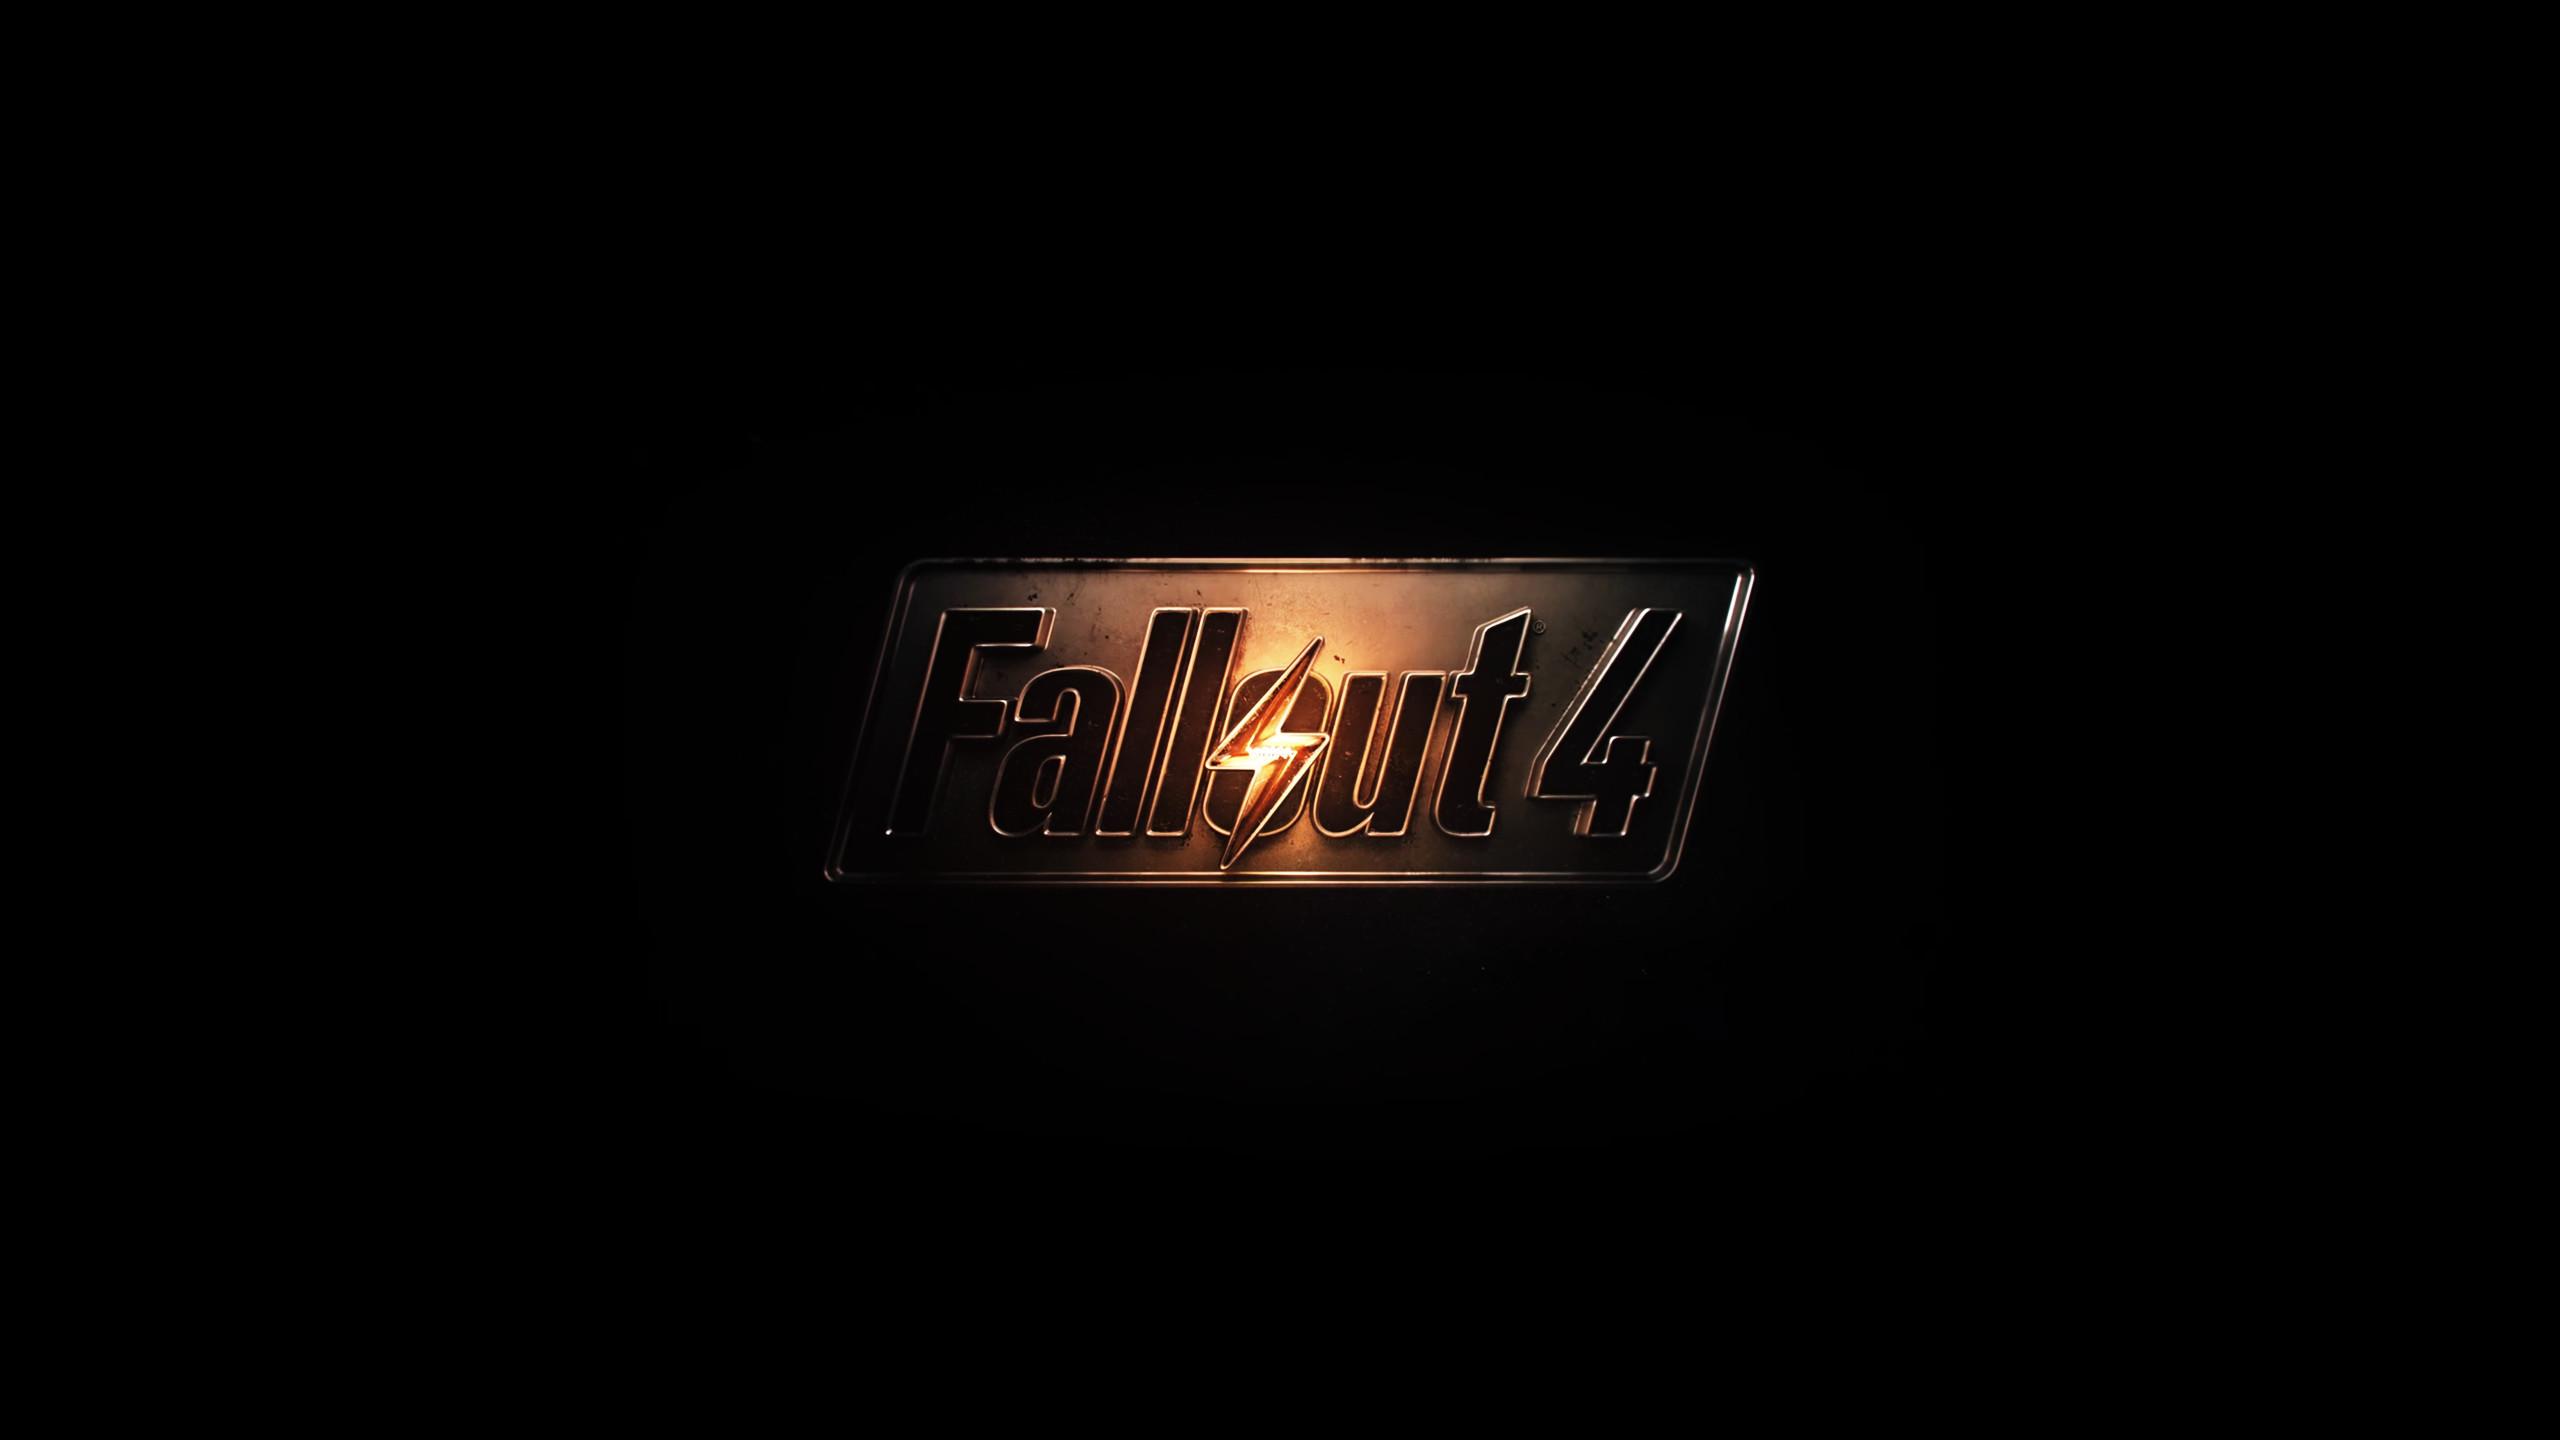 Fallout-logo-wallpaper-HD-for-desktop